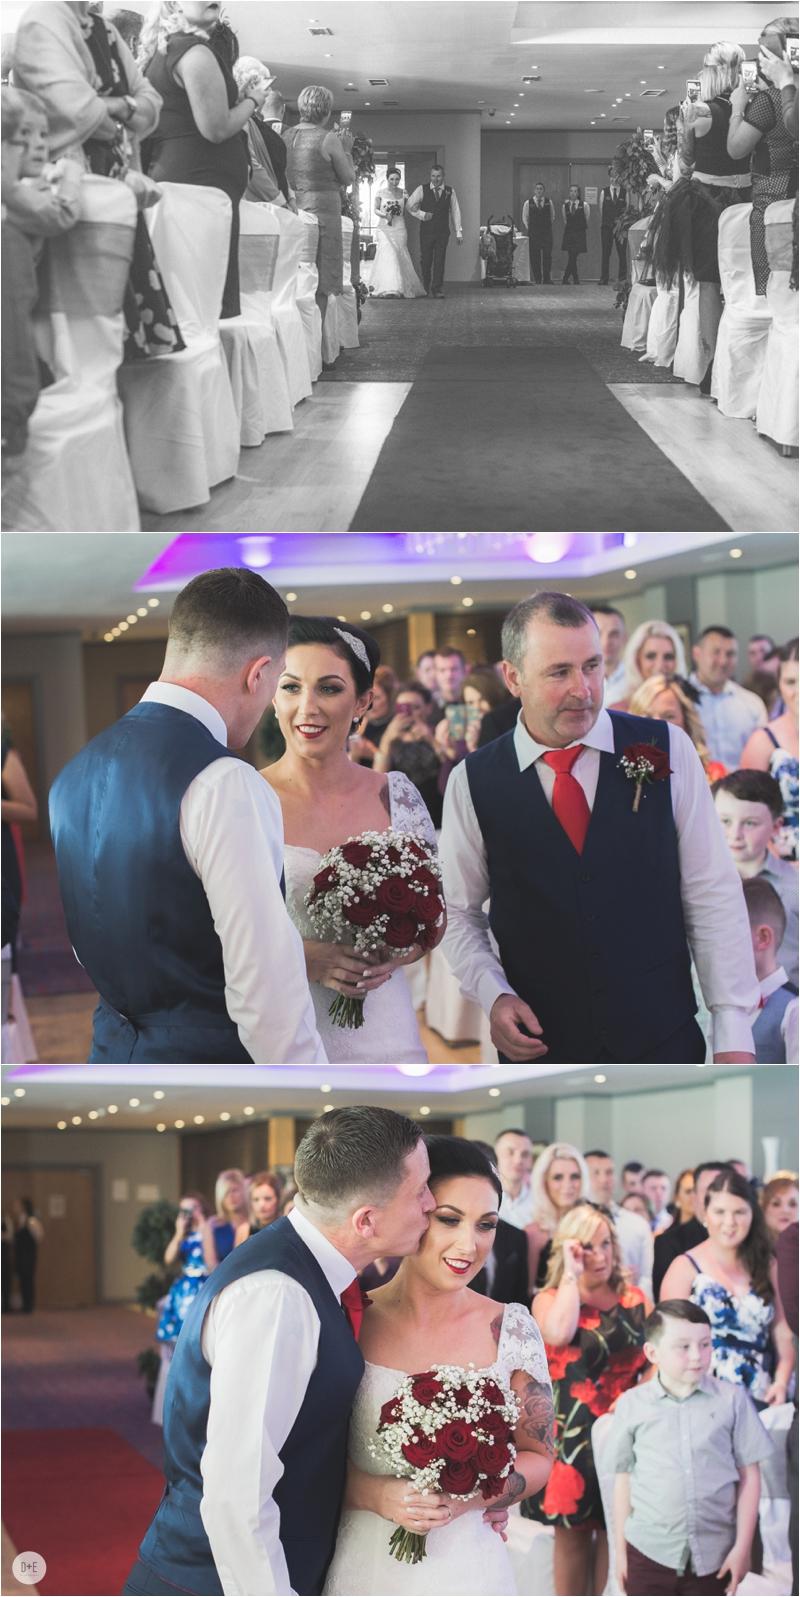 belinda-rob-wedding-carlow-talbot-ireland-deanella.com_0033.jpg